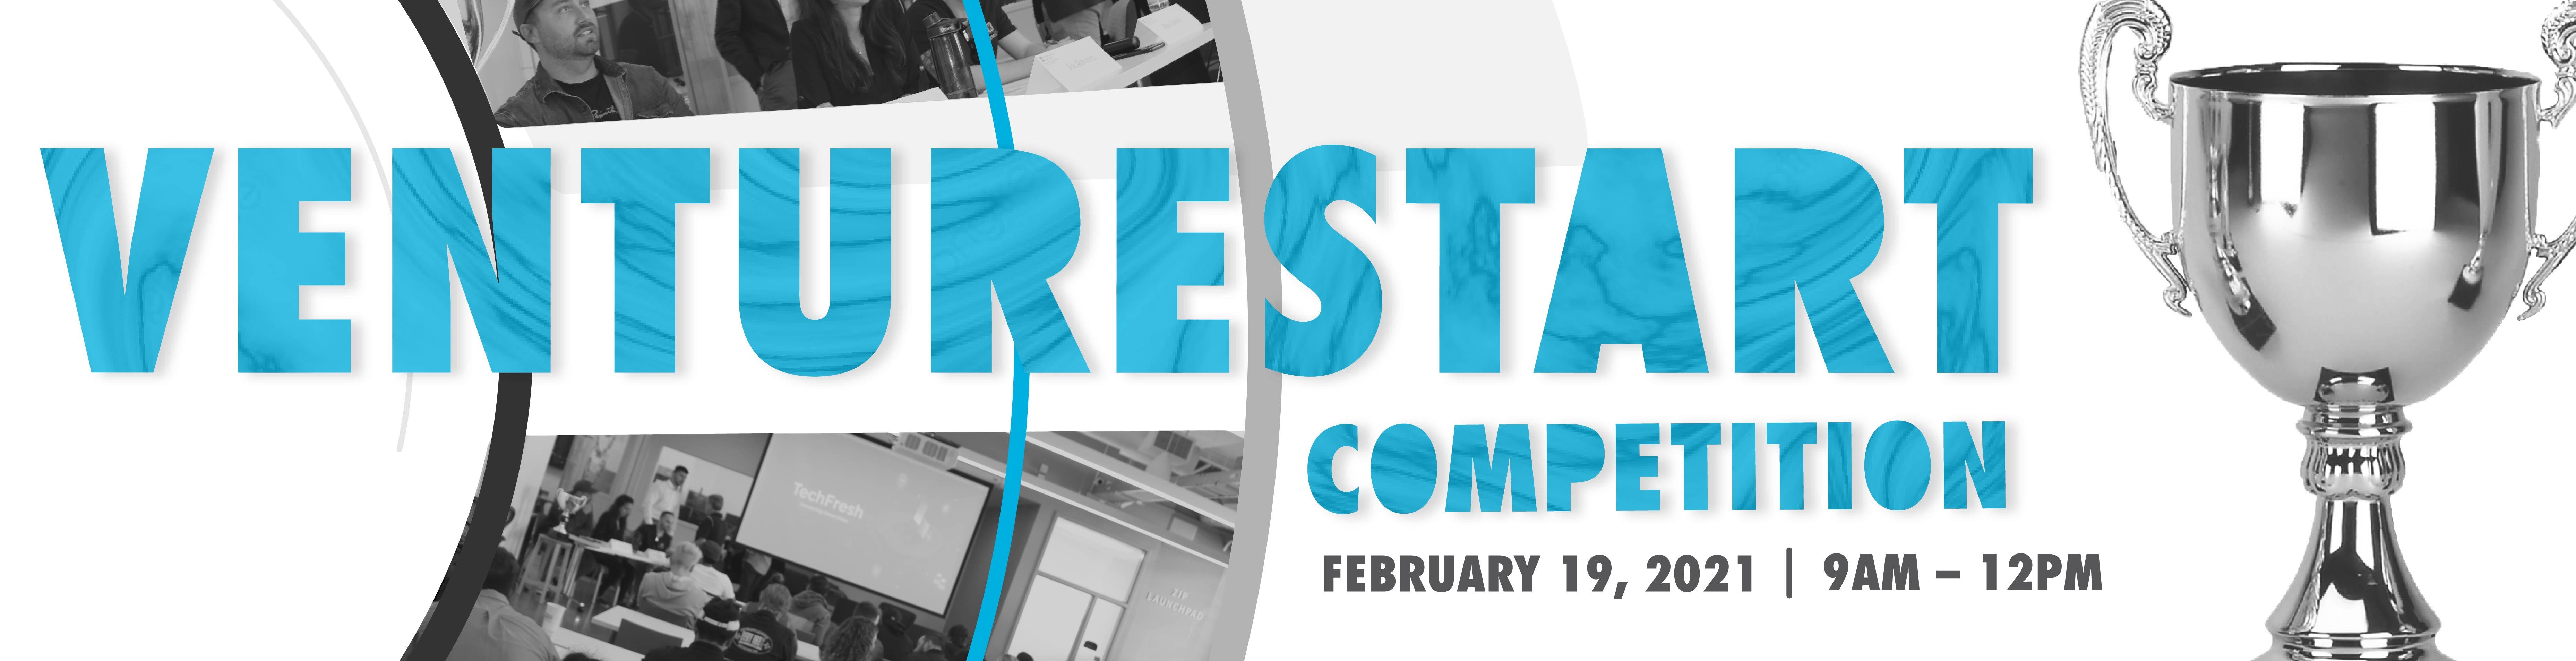 VentureStart Competition